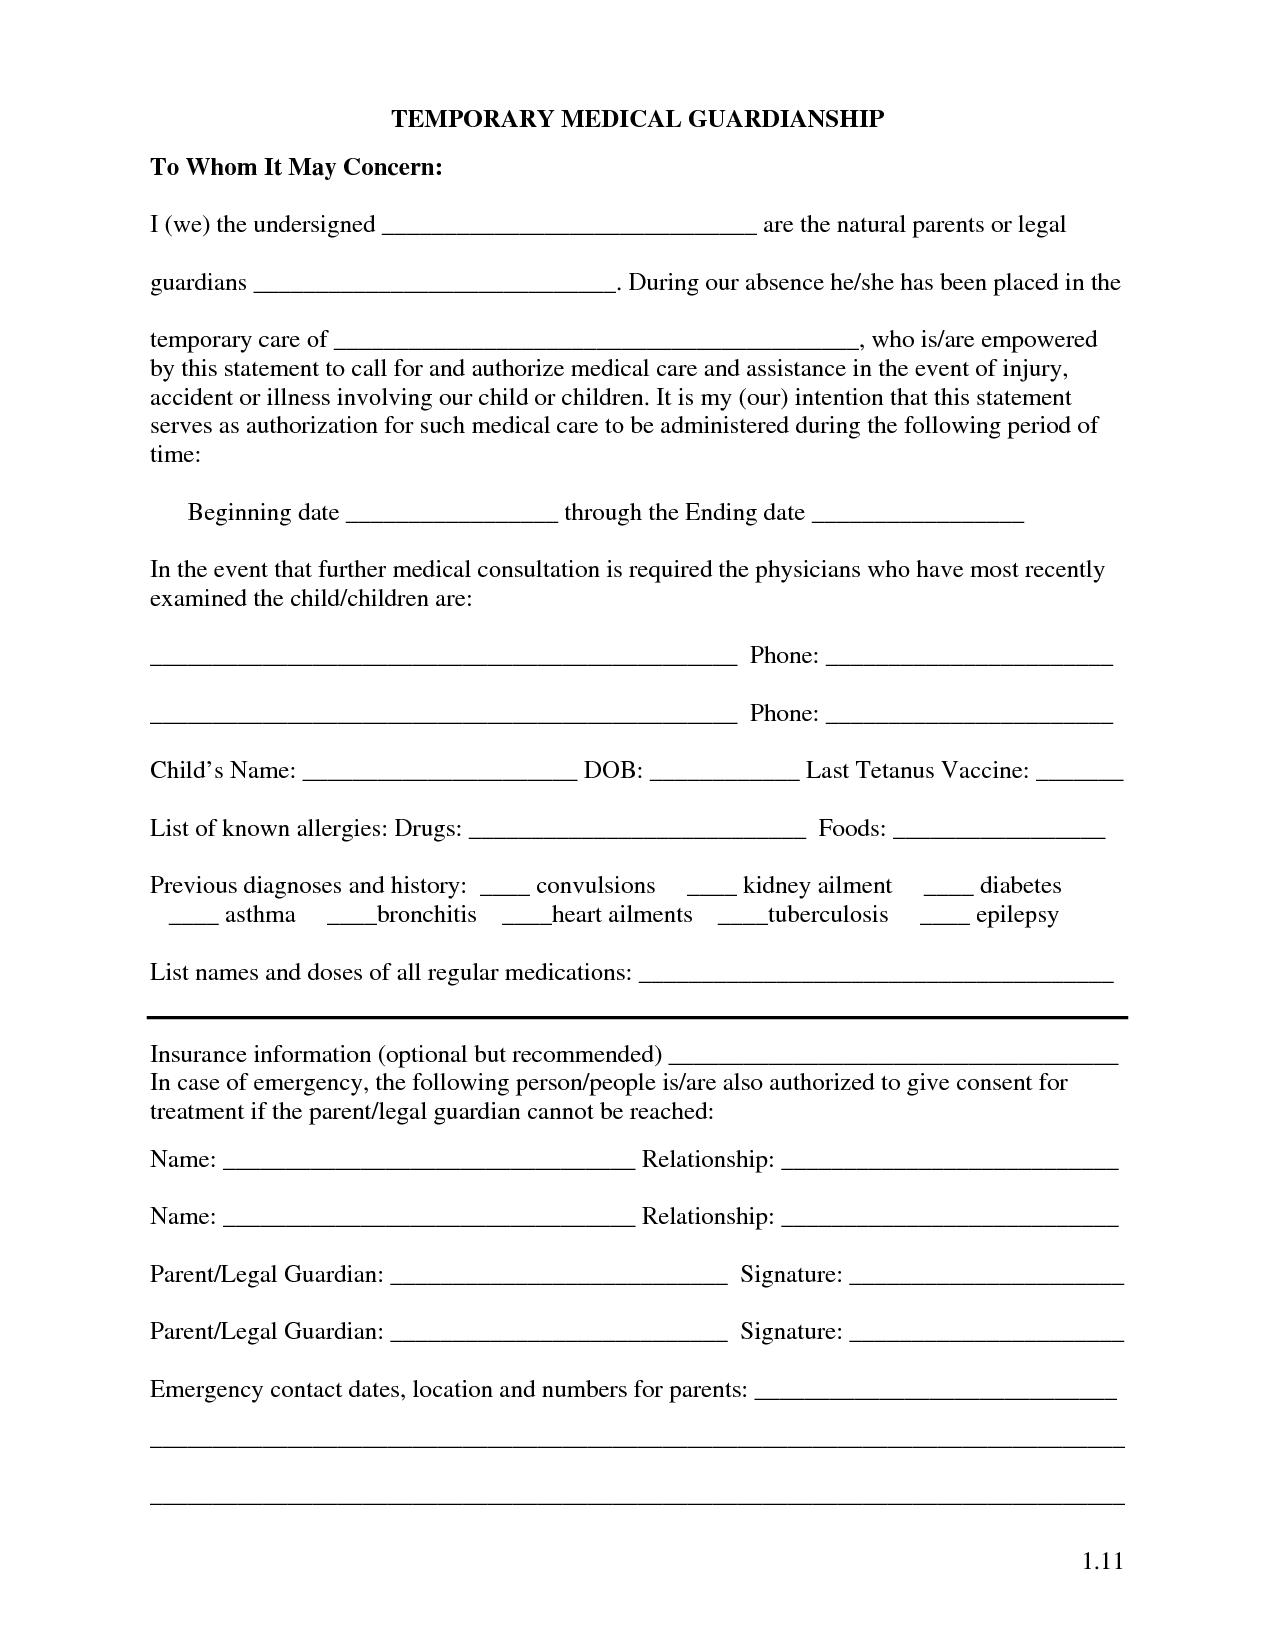 Free Printable Temporary Guardianship Forms   Forms - Free Printable Child Custody Forms